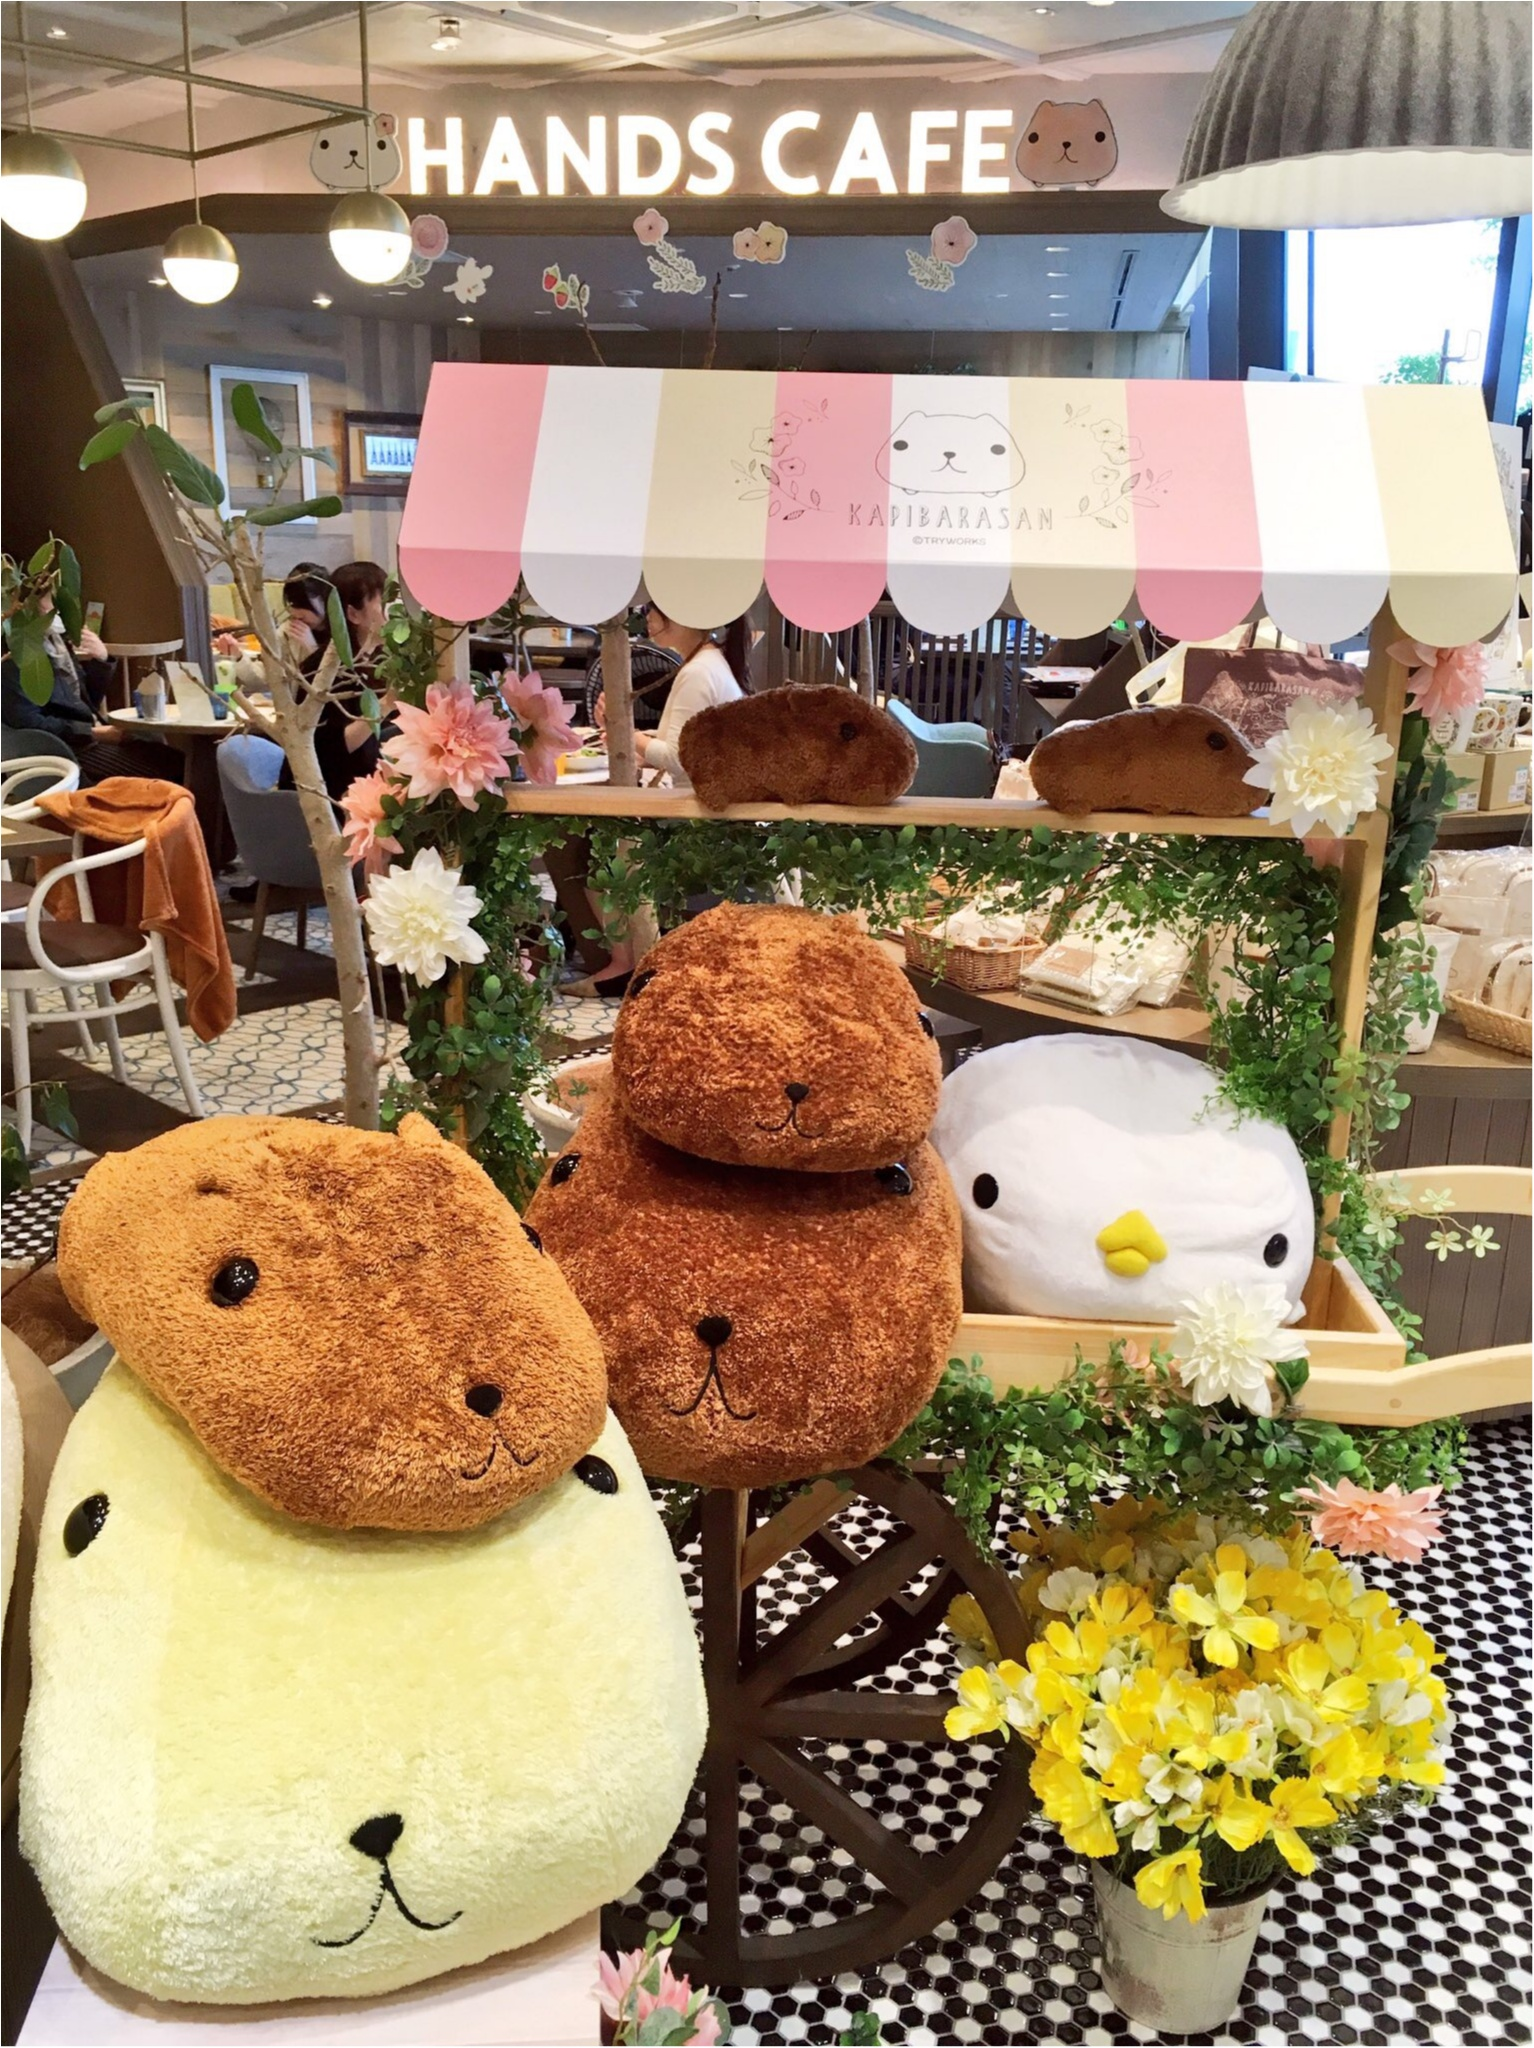 『KAPIBARASAN×HANDS CAFE』@東急表参道原宿店♡りぃイチオシメニューのご紹介(∗•ω•∗)♡_2